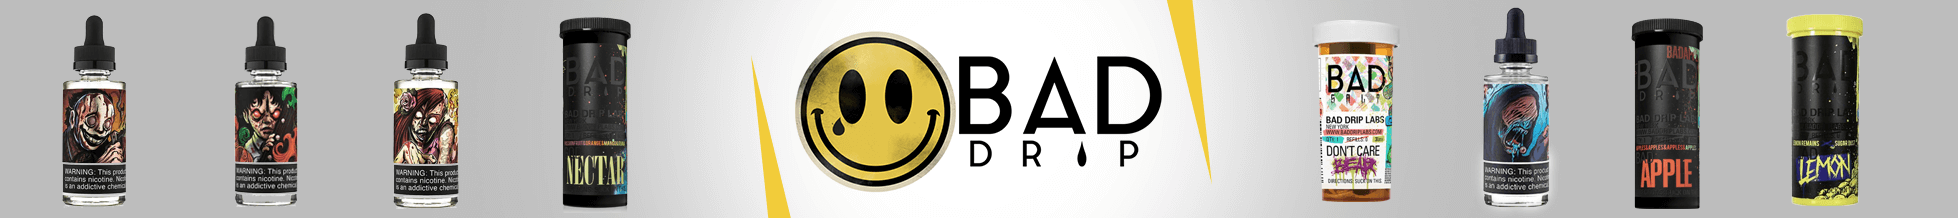 bad-drip-e-juice.png